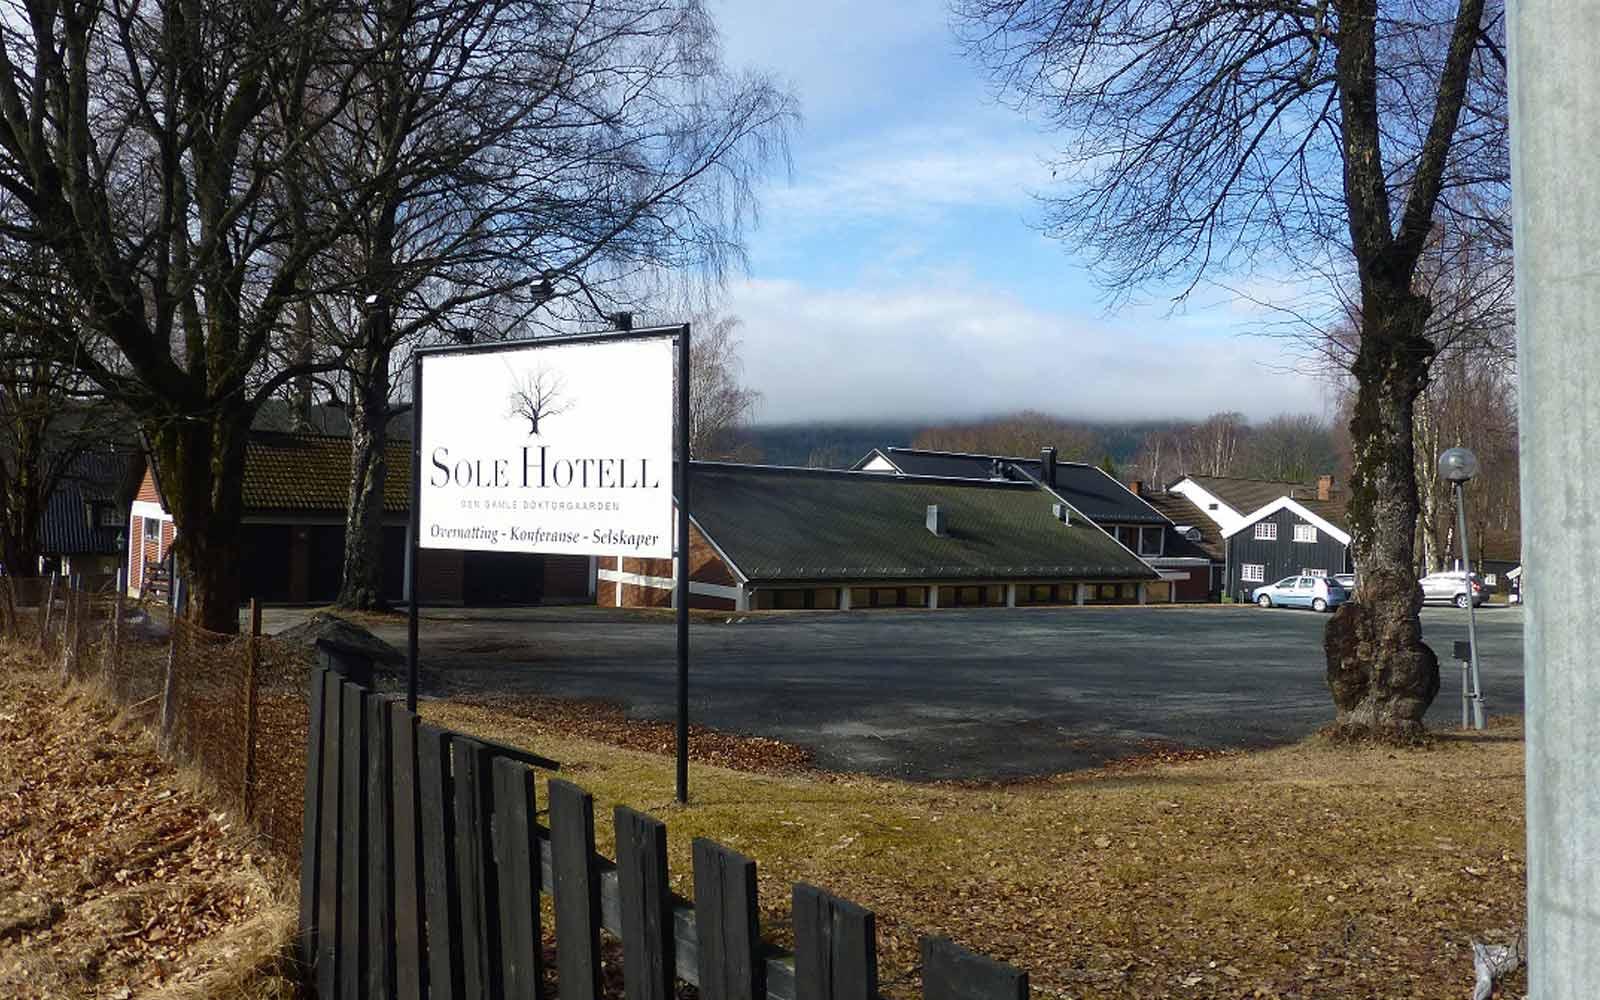 Das Sole Hotel in Norwegen